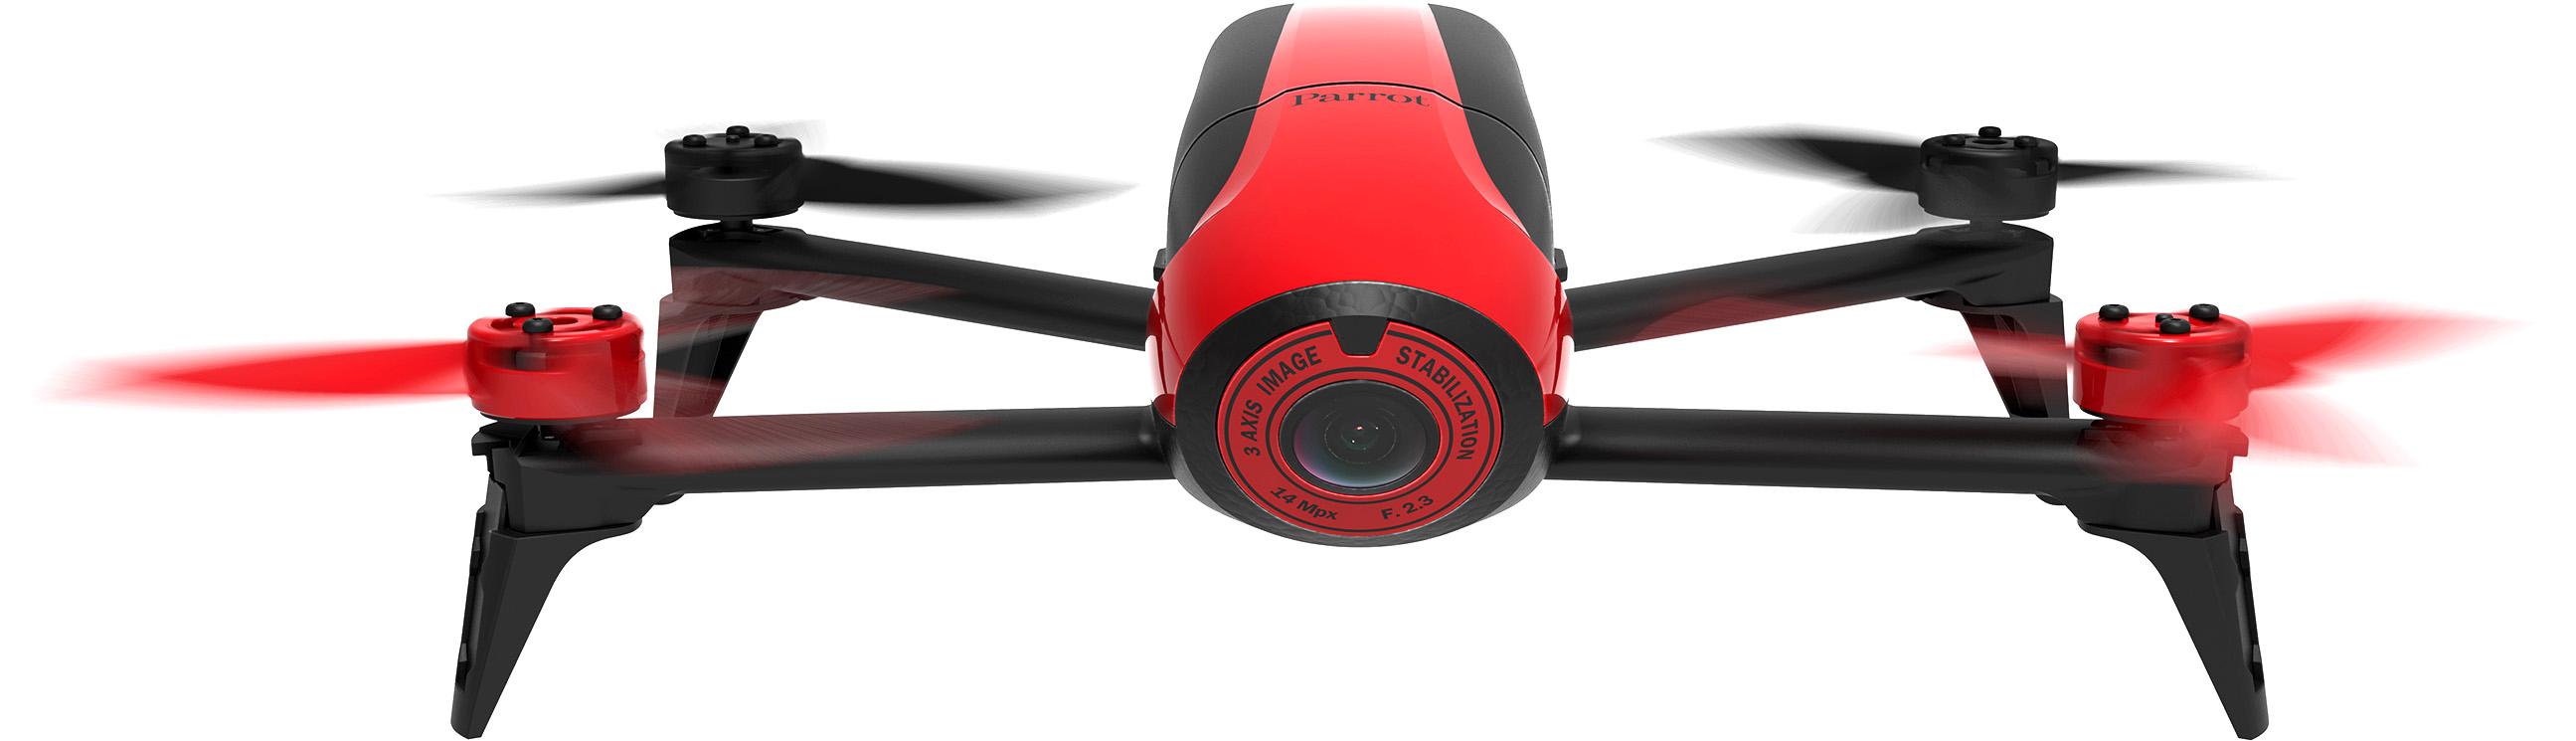 Parrot Bebop Drone 2 (rood)